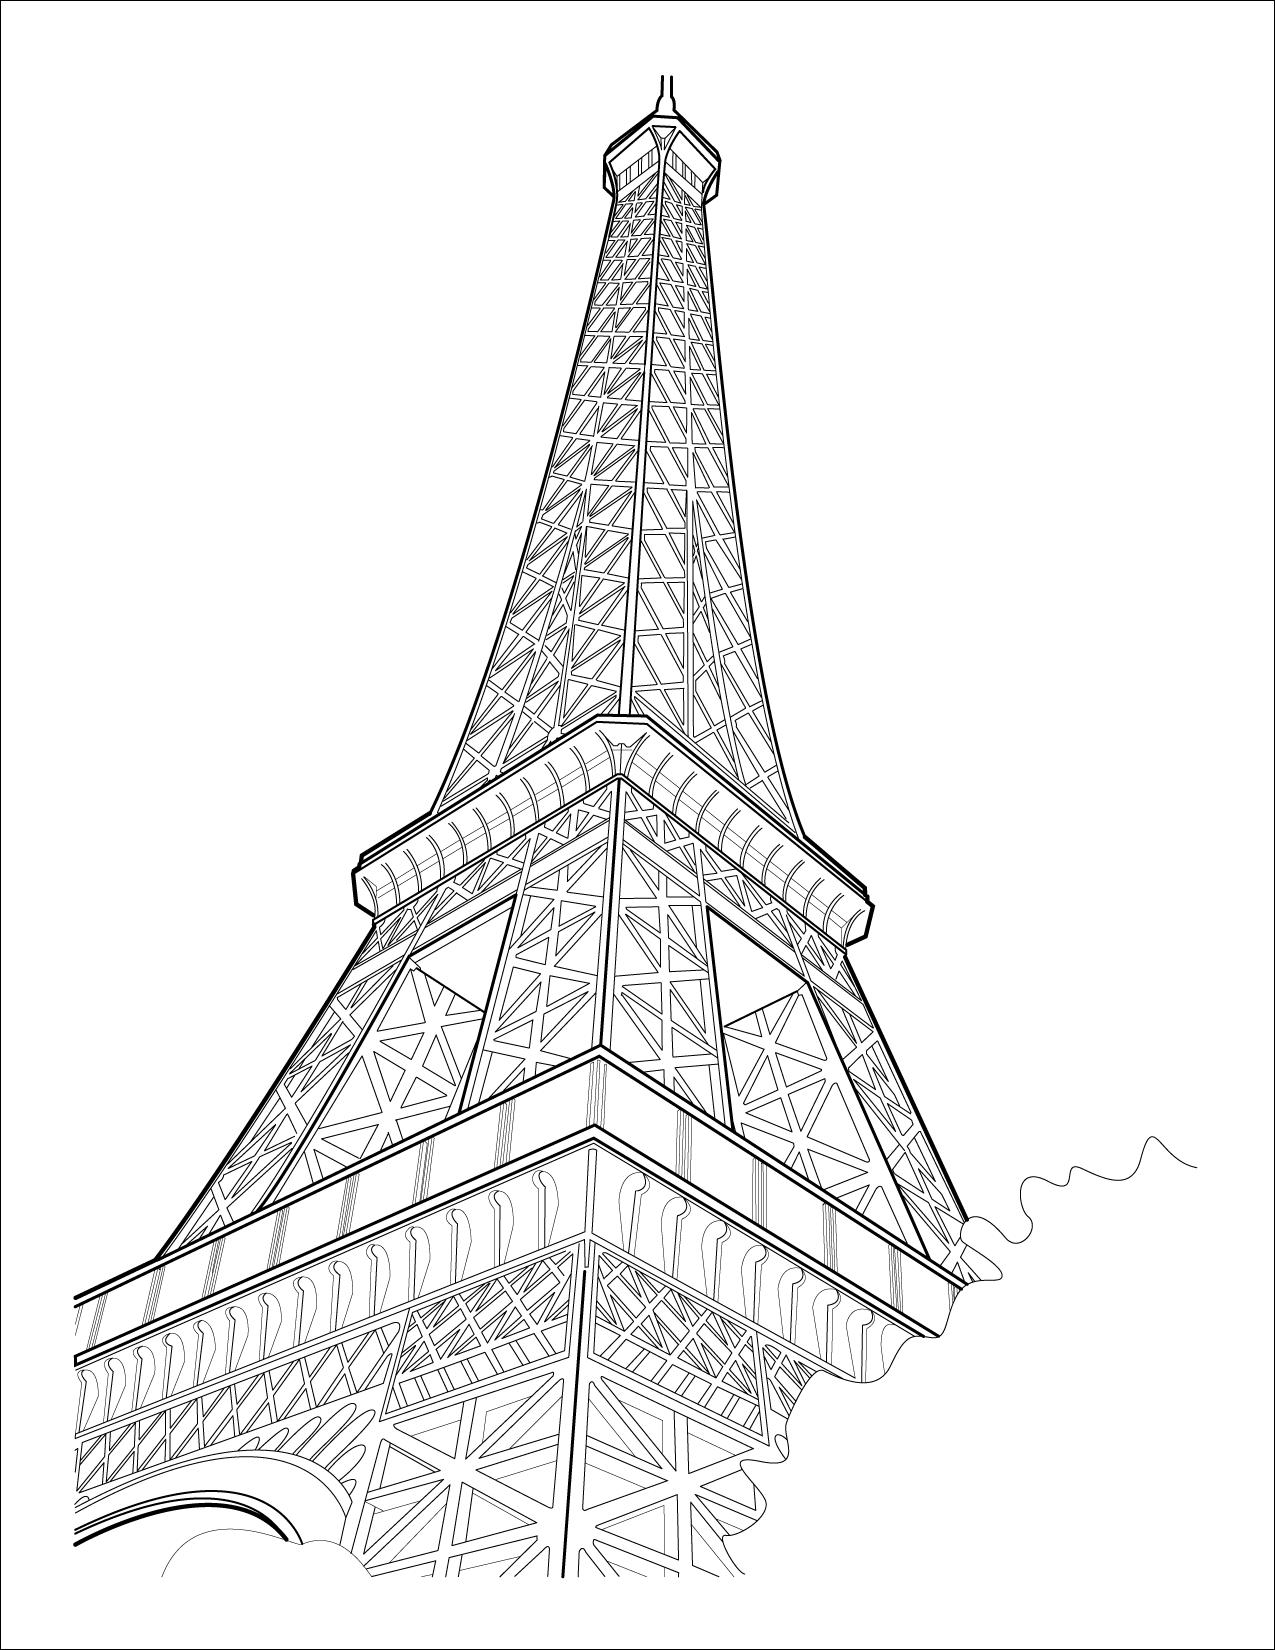 Line Drawing Eiffel Tower : Eiffel tower by kcbiehl on deviantart